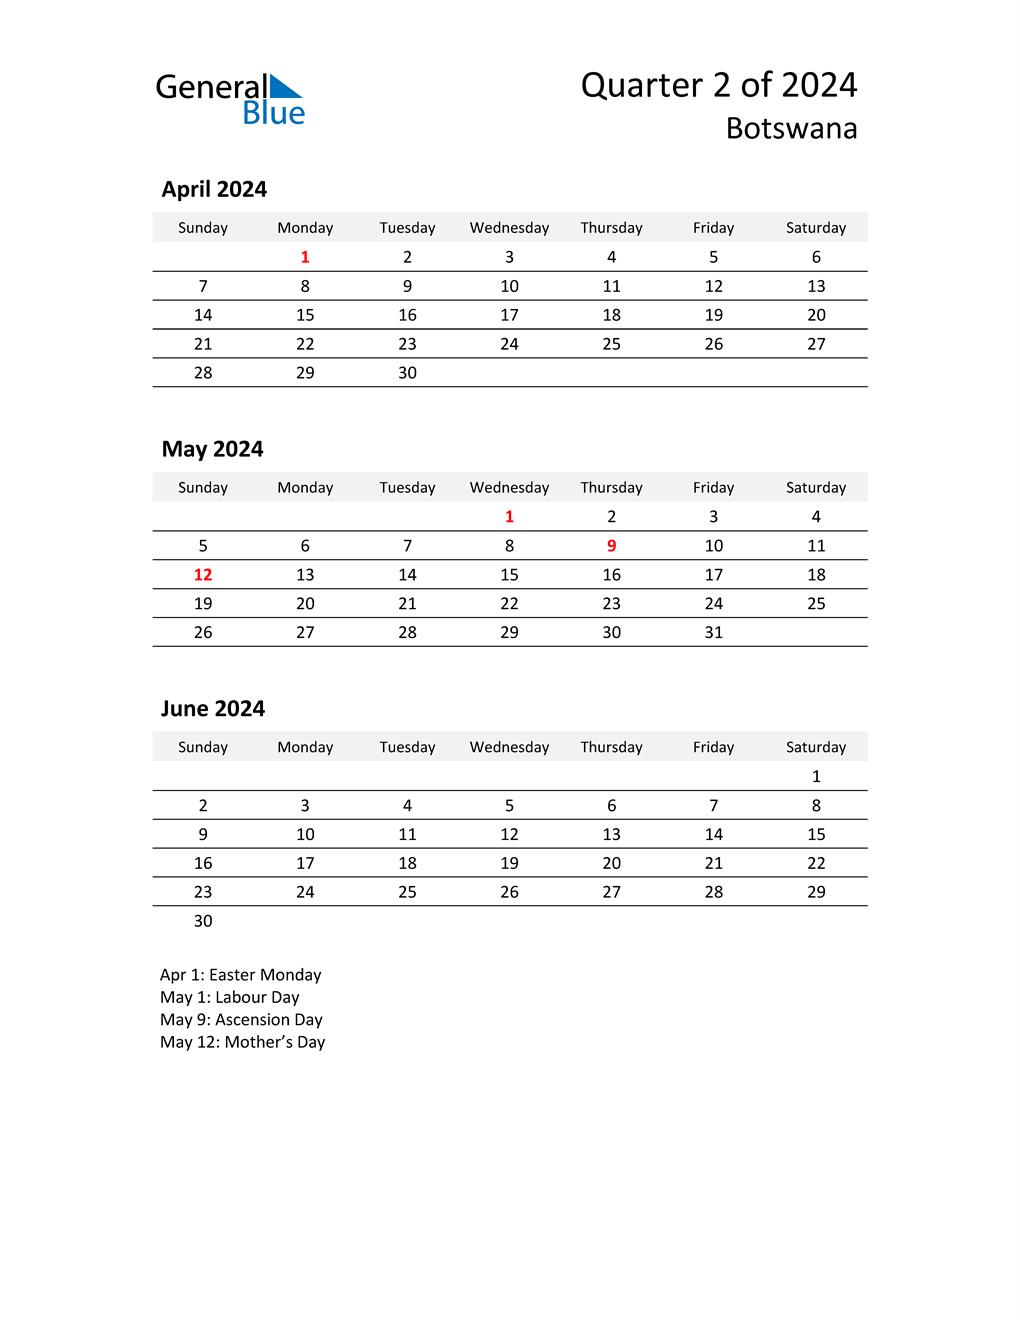 2024 Three-Month Calendar for Botswana